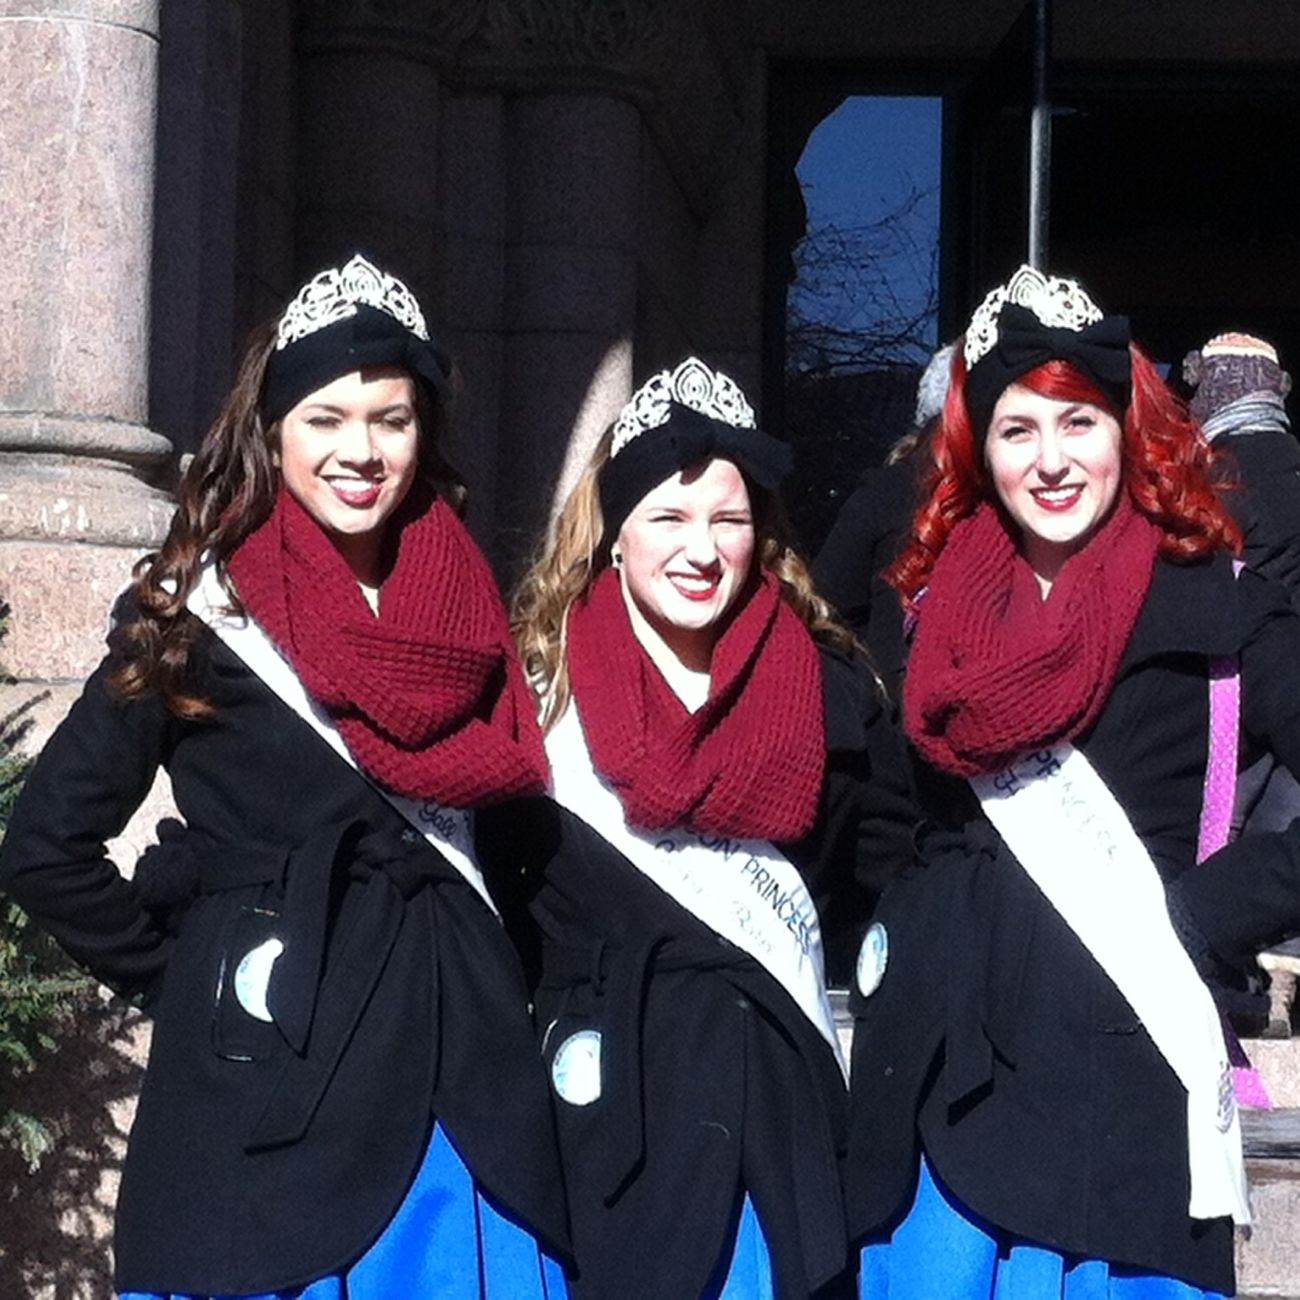 ??❄Ice Princesses ❄?? Freezing Cold Princesses